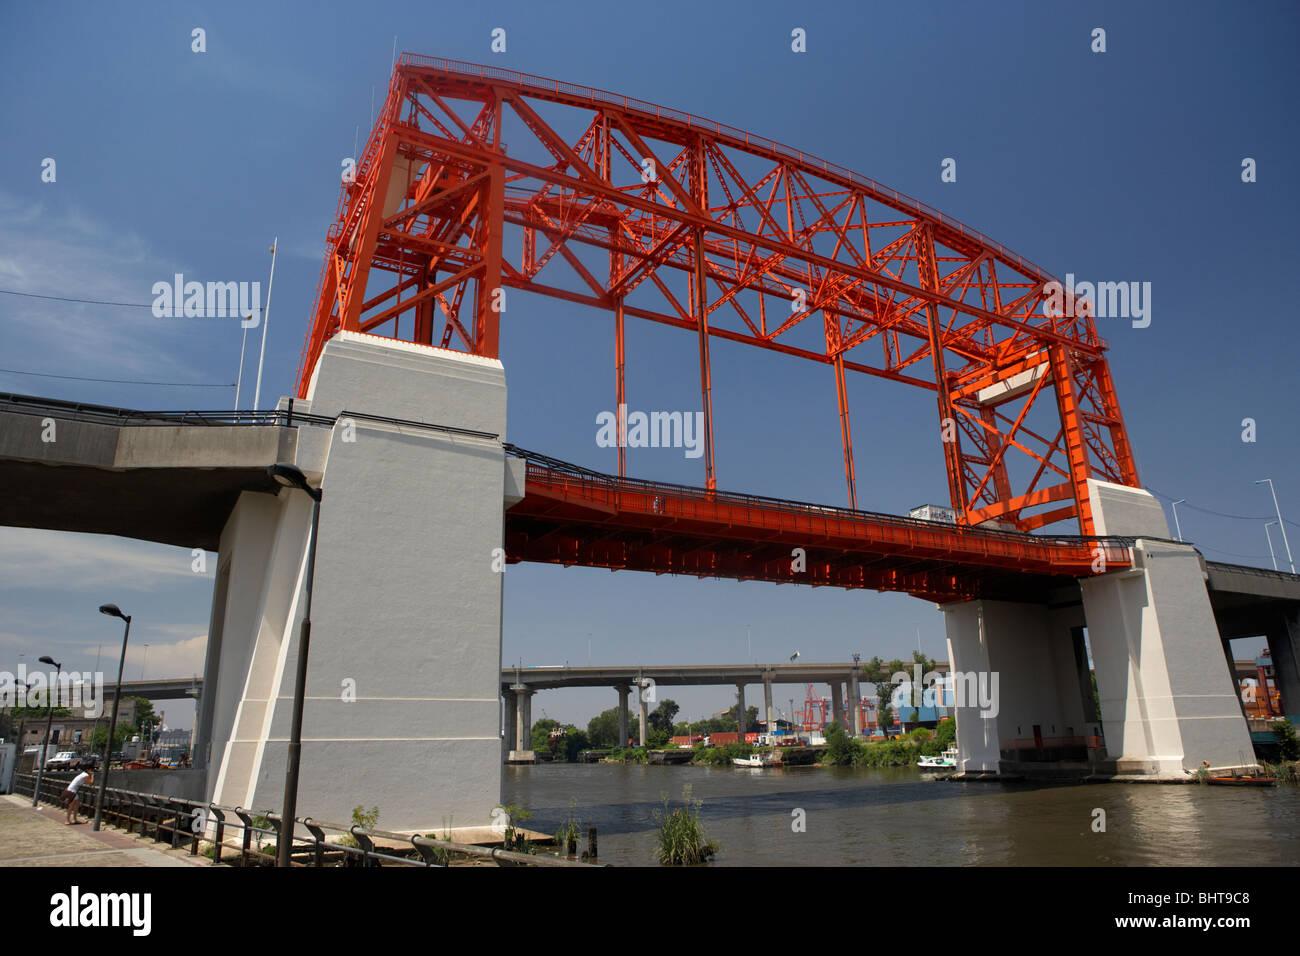 new nicolas avellaneda bridge across the riachuelo river la boca capital federal buenos aires republic of argentina - Stock Image